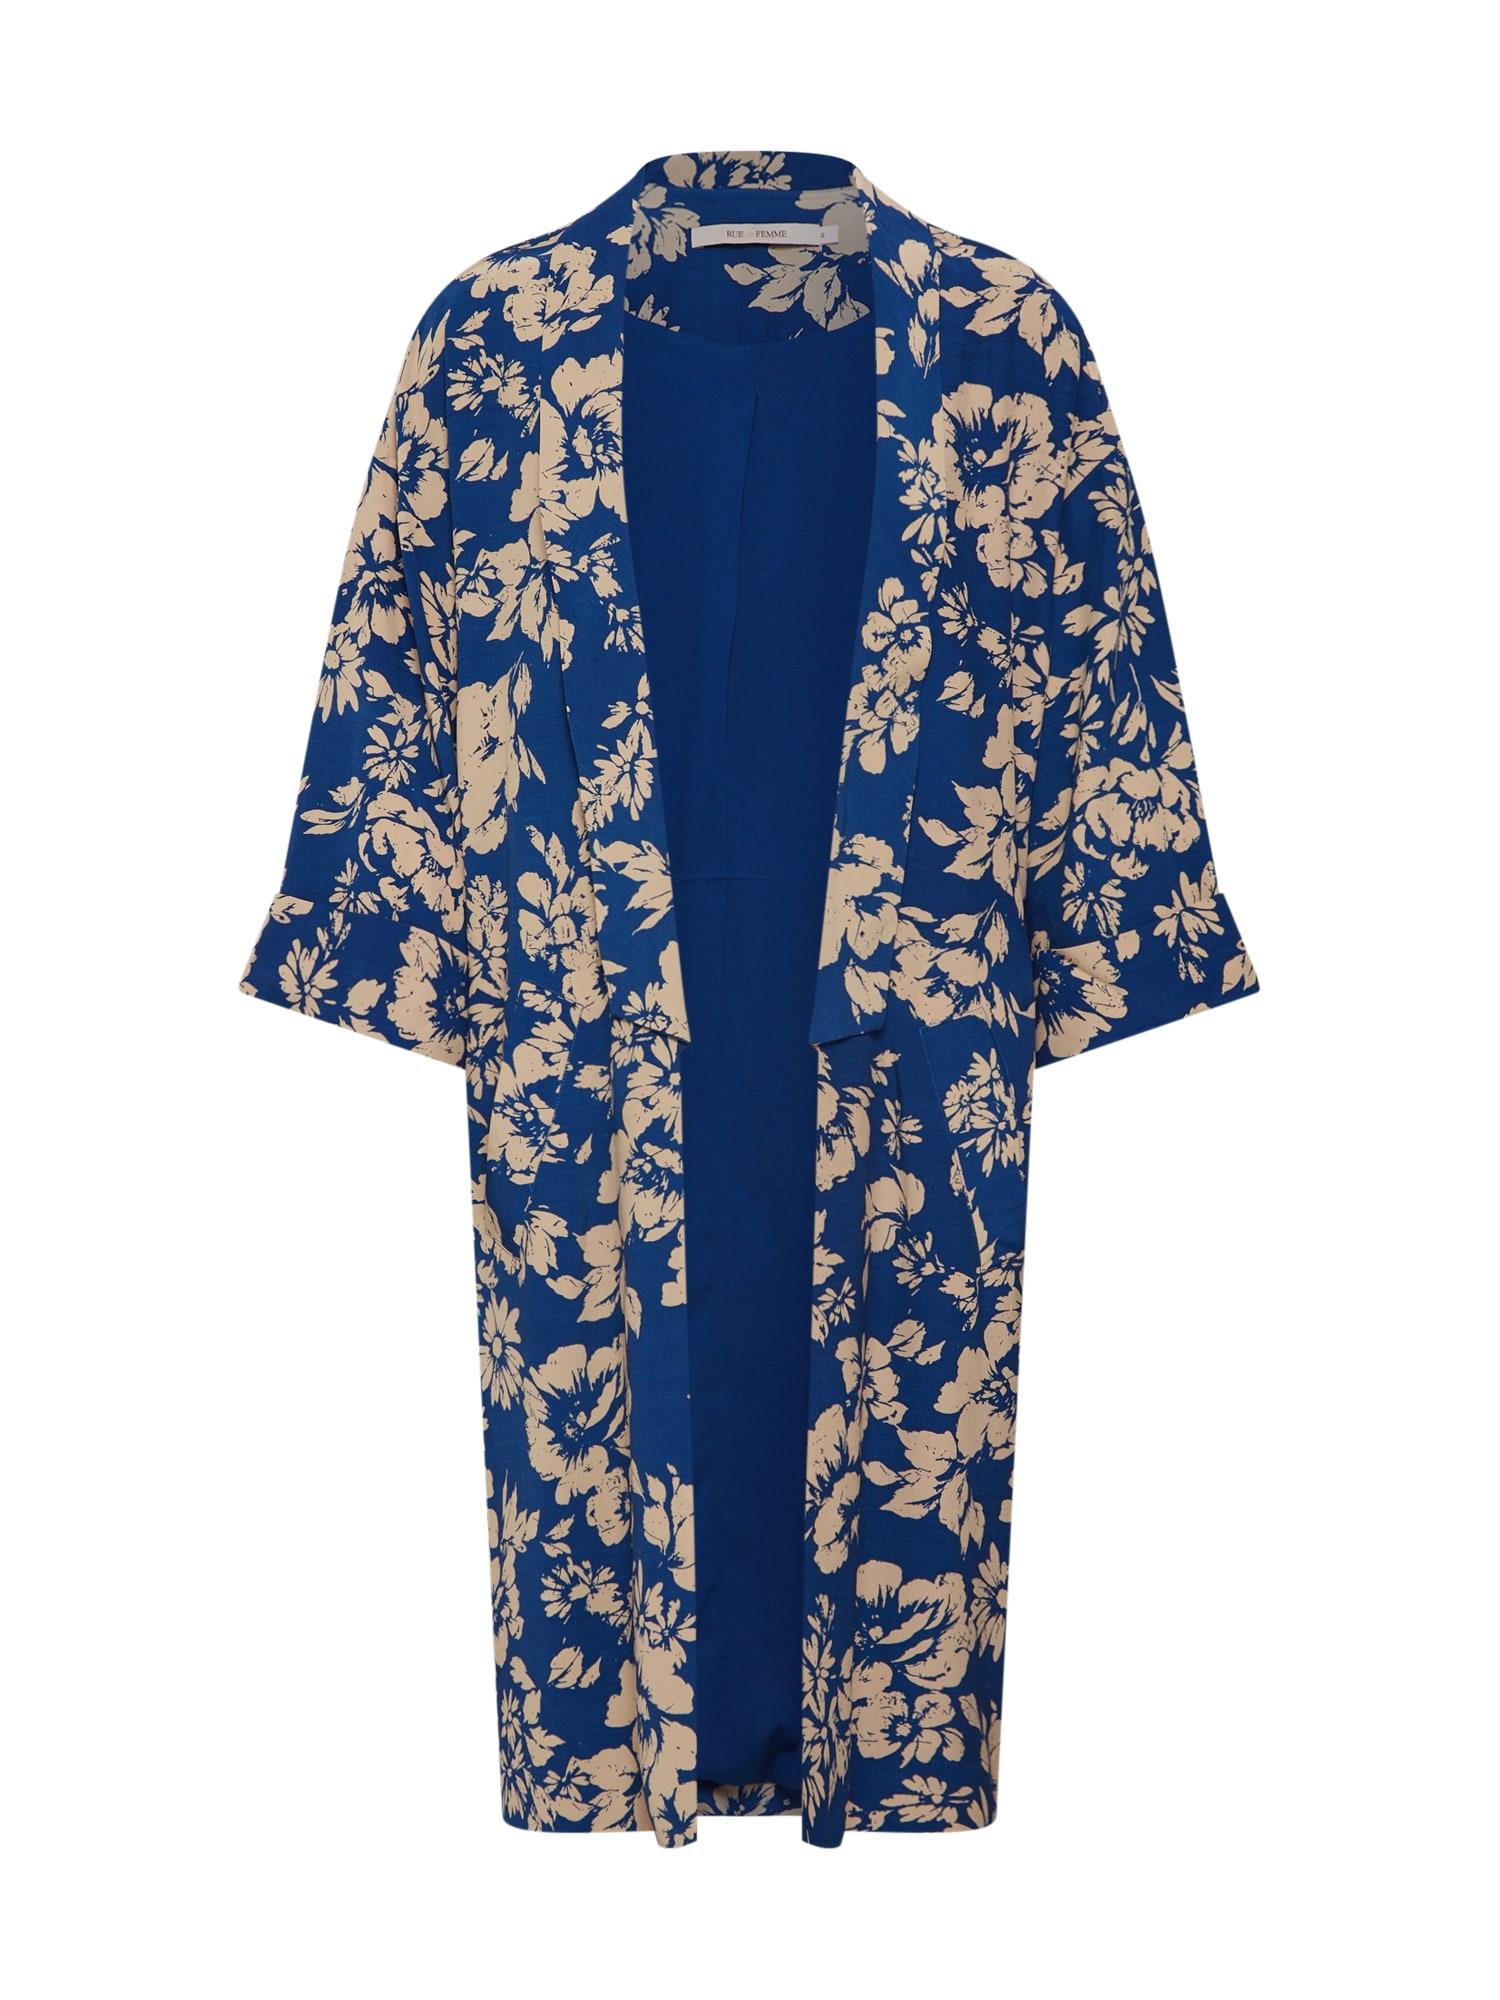 RUE De FEMME, Dames Kimono 'Greacia', beige / donkerblauw